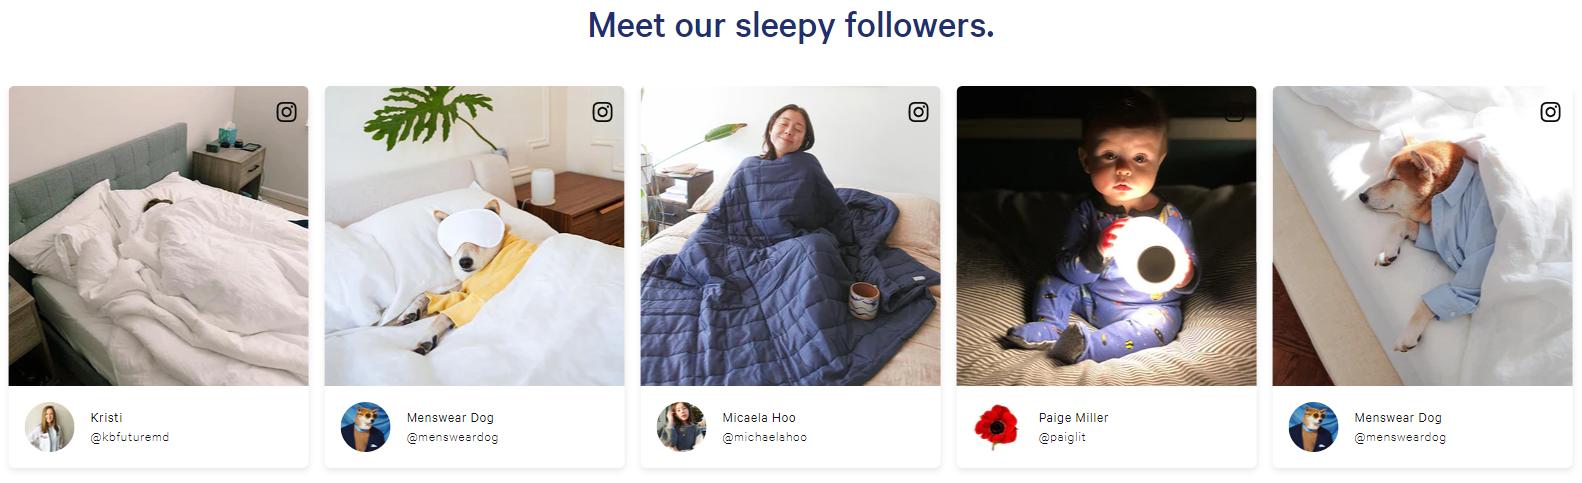 casper instagram feed